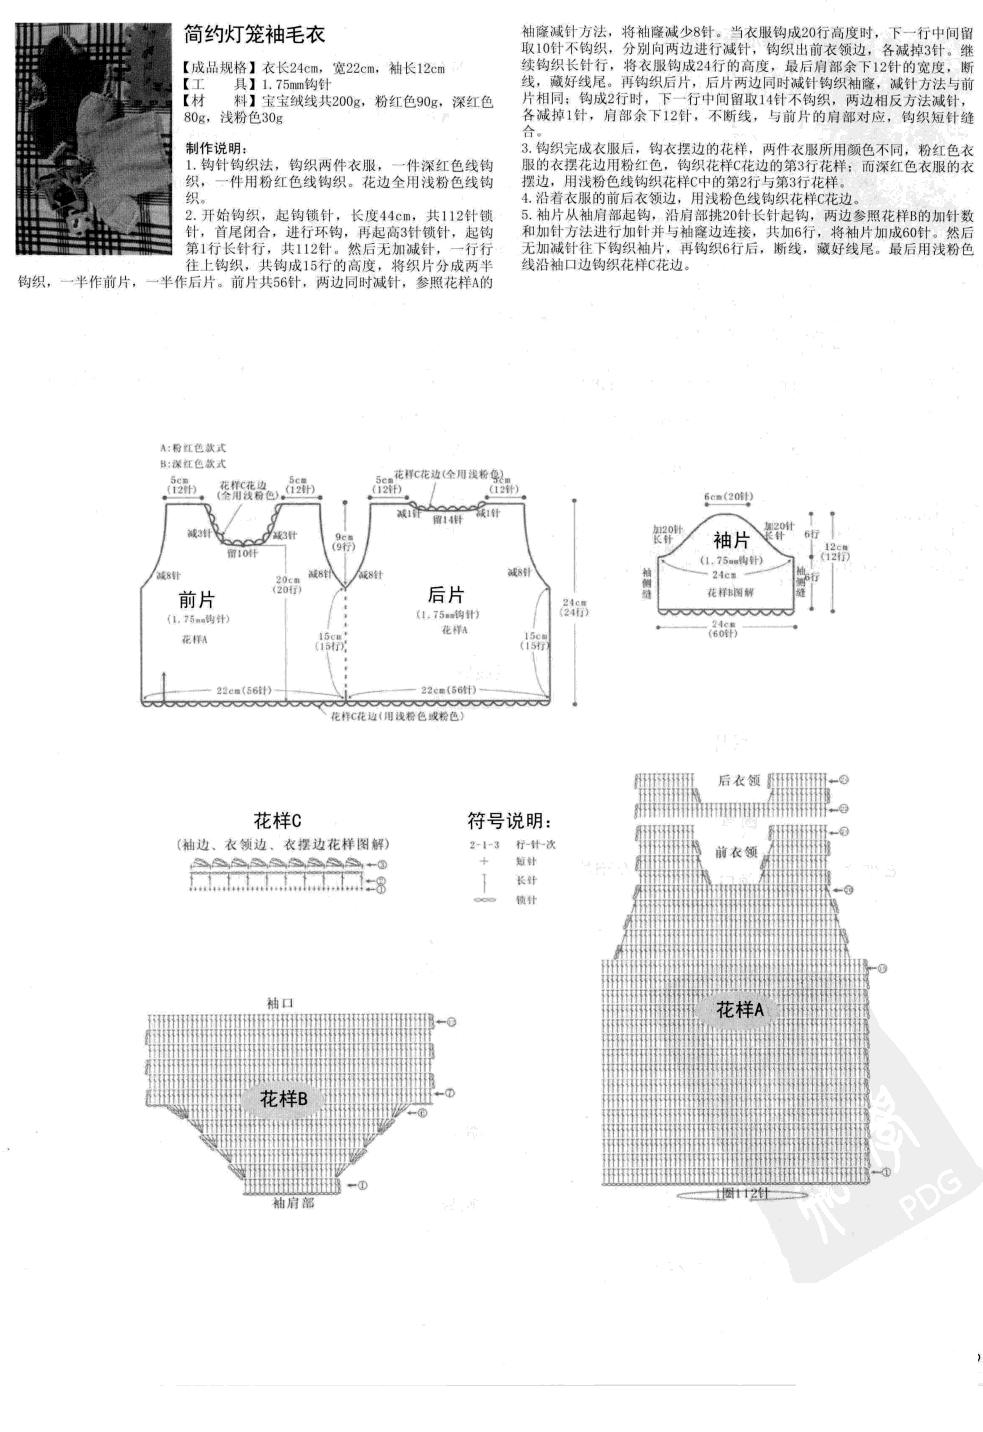 p (159).jpg